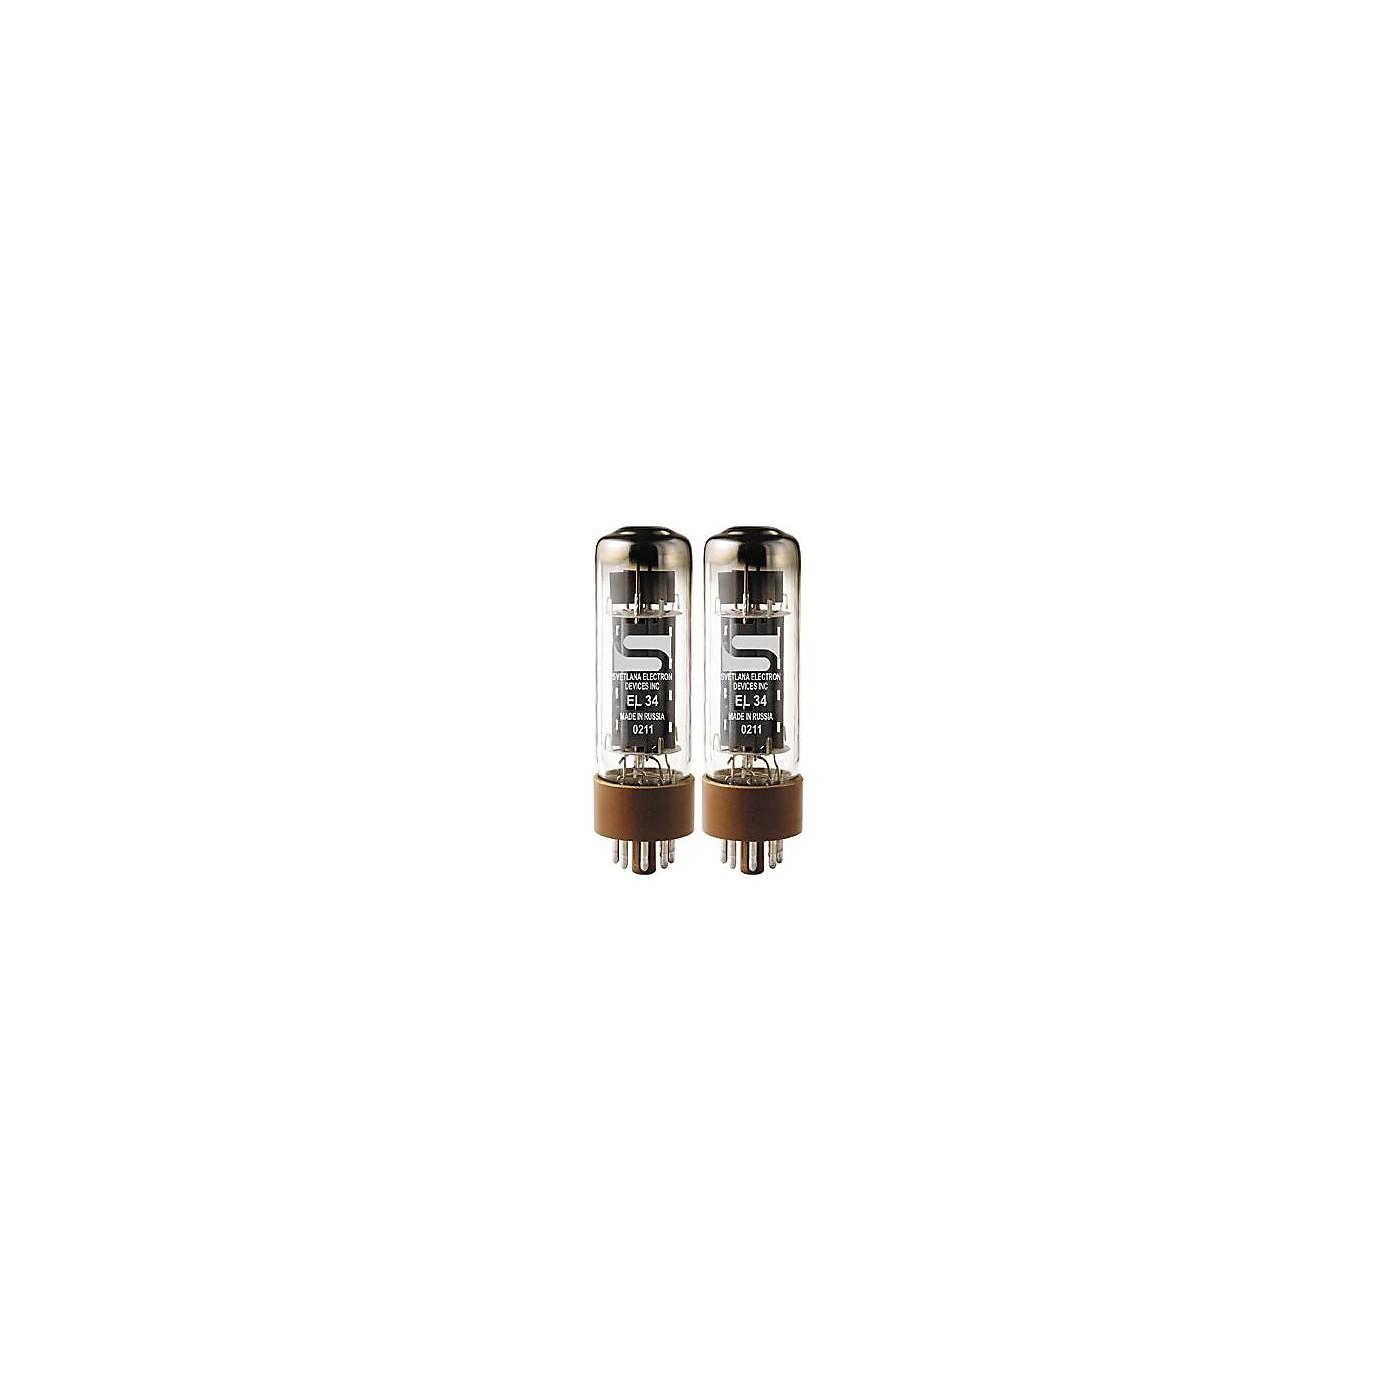 Svetlana EL34 Matched Power Tubes thumbnail